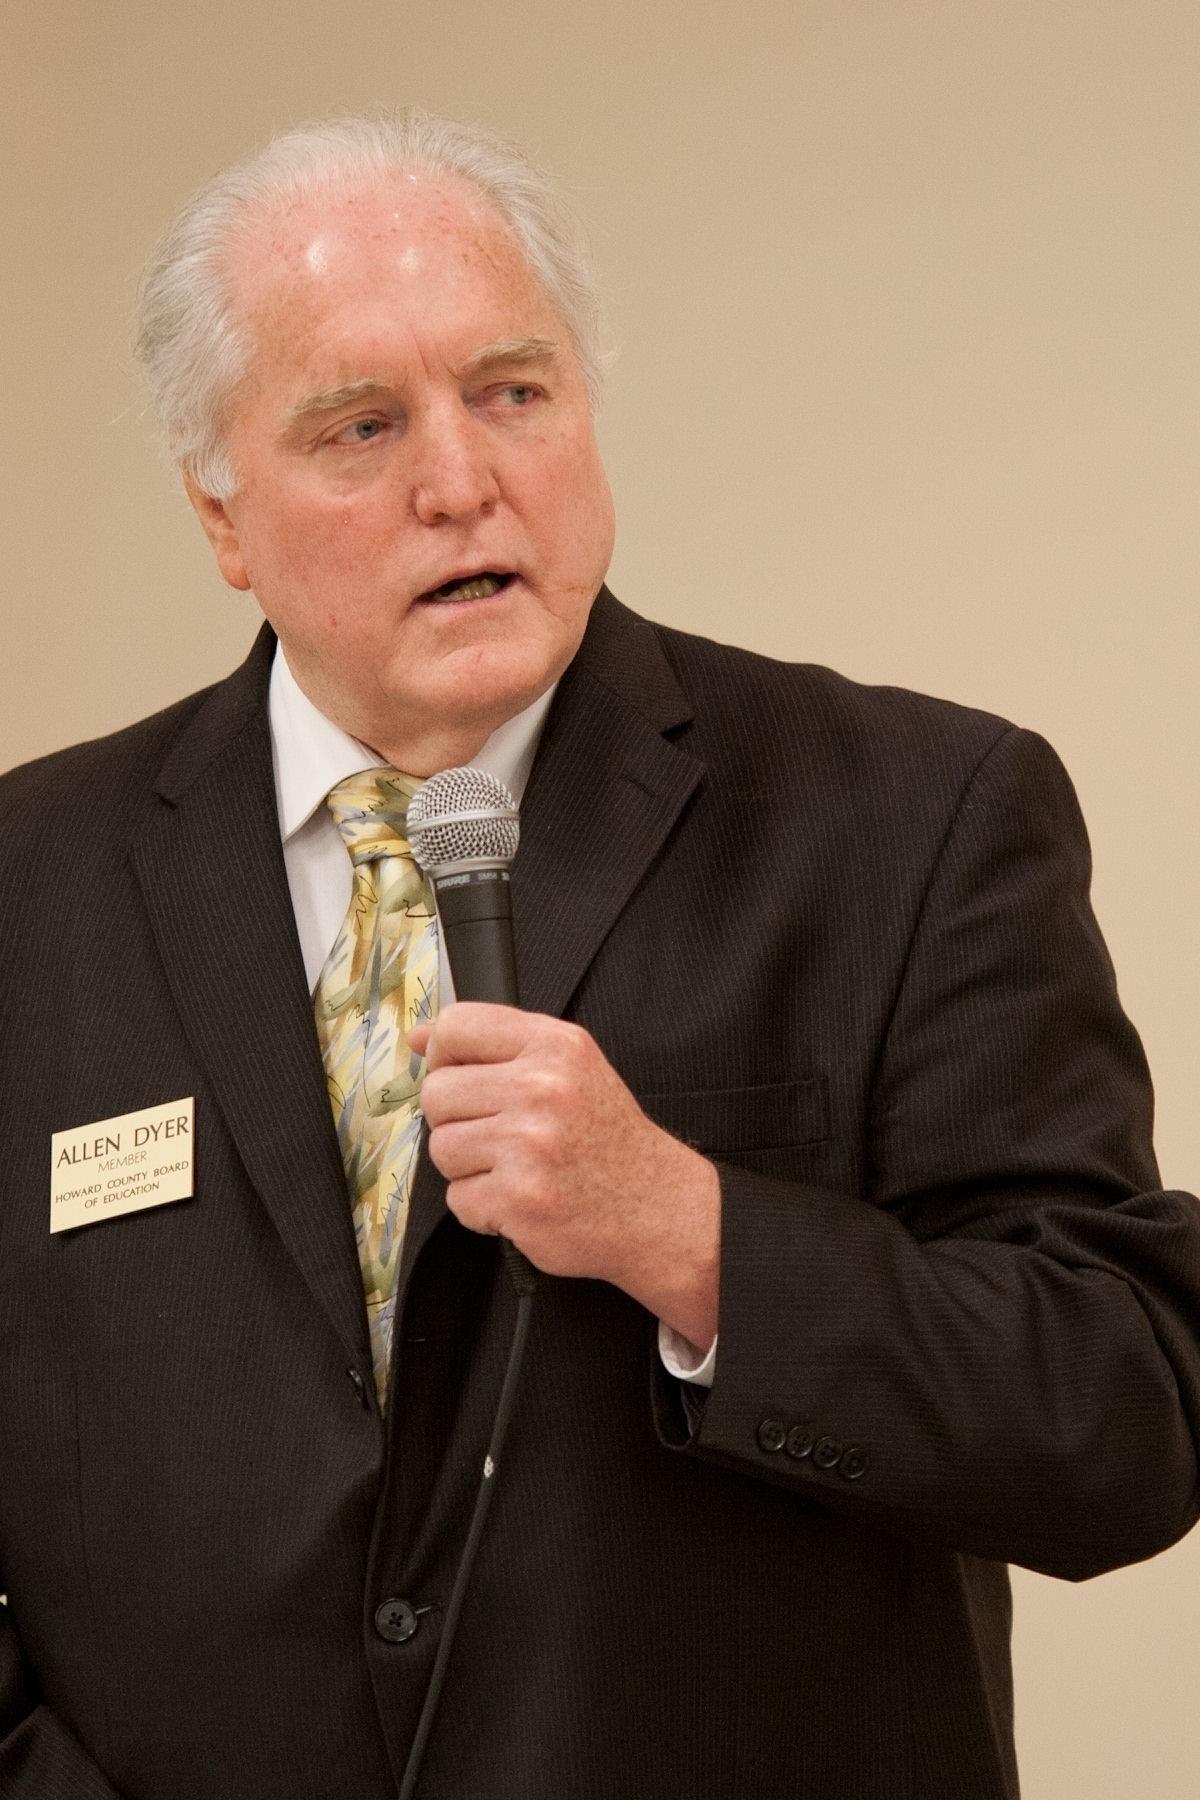 Pictured is Howard County school board candidate Allen Dyer.